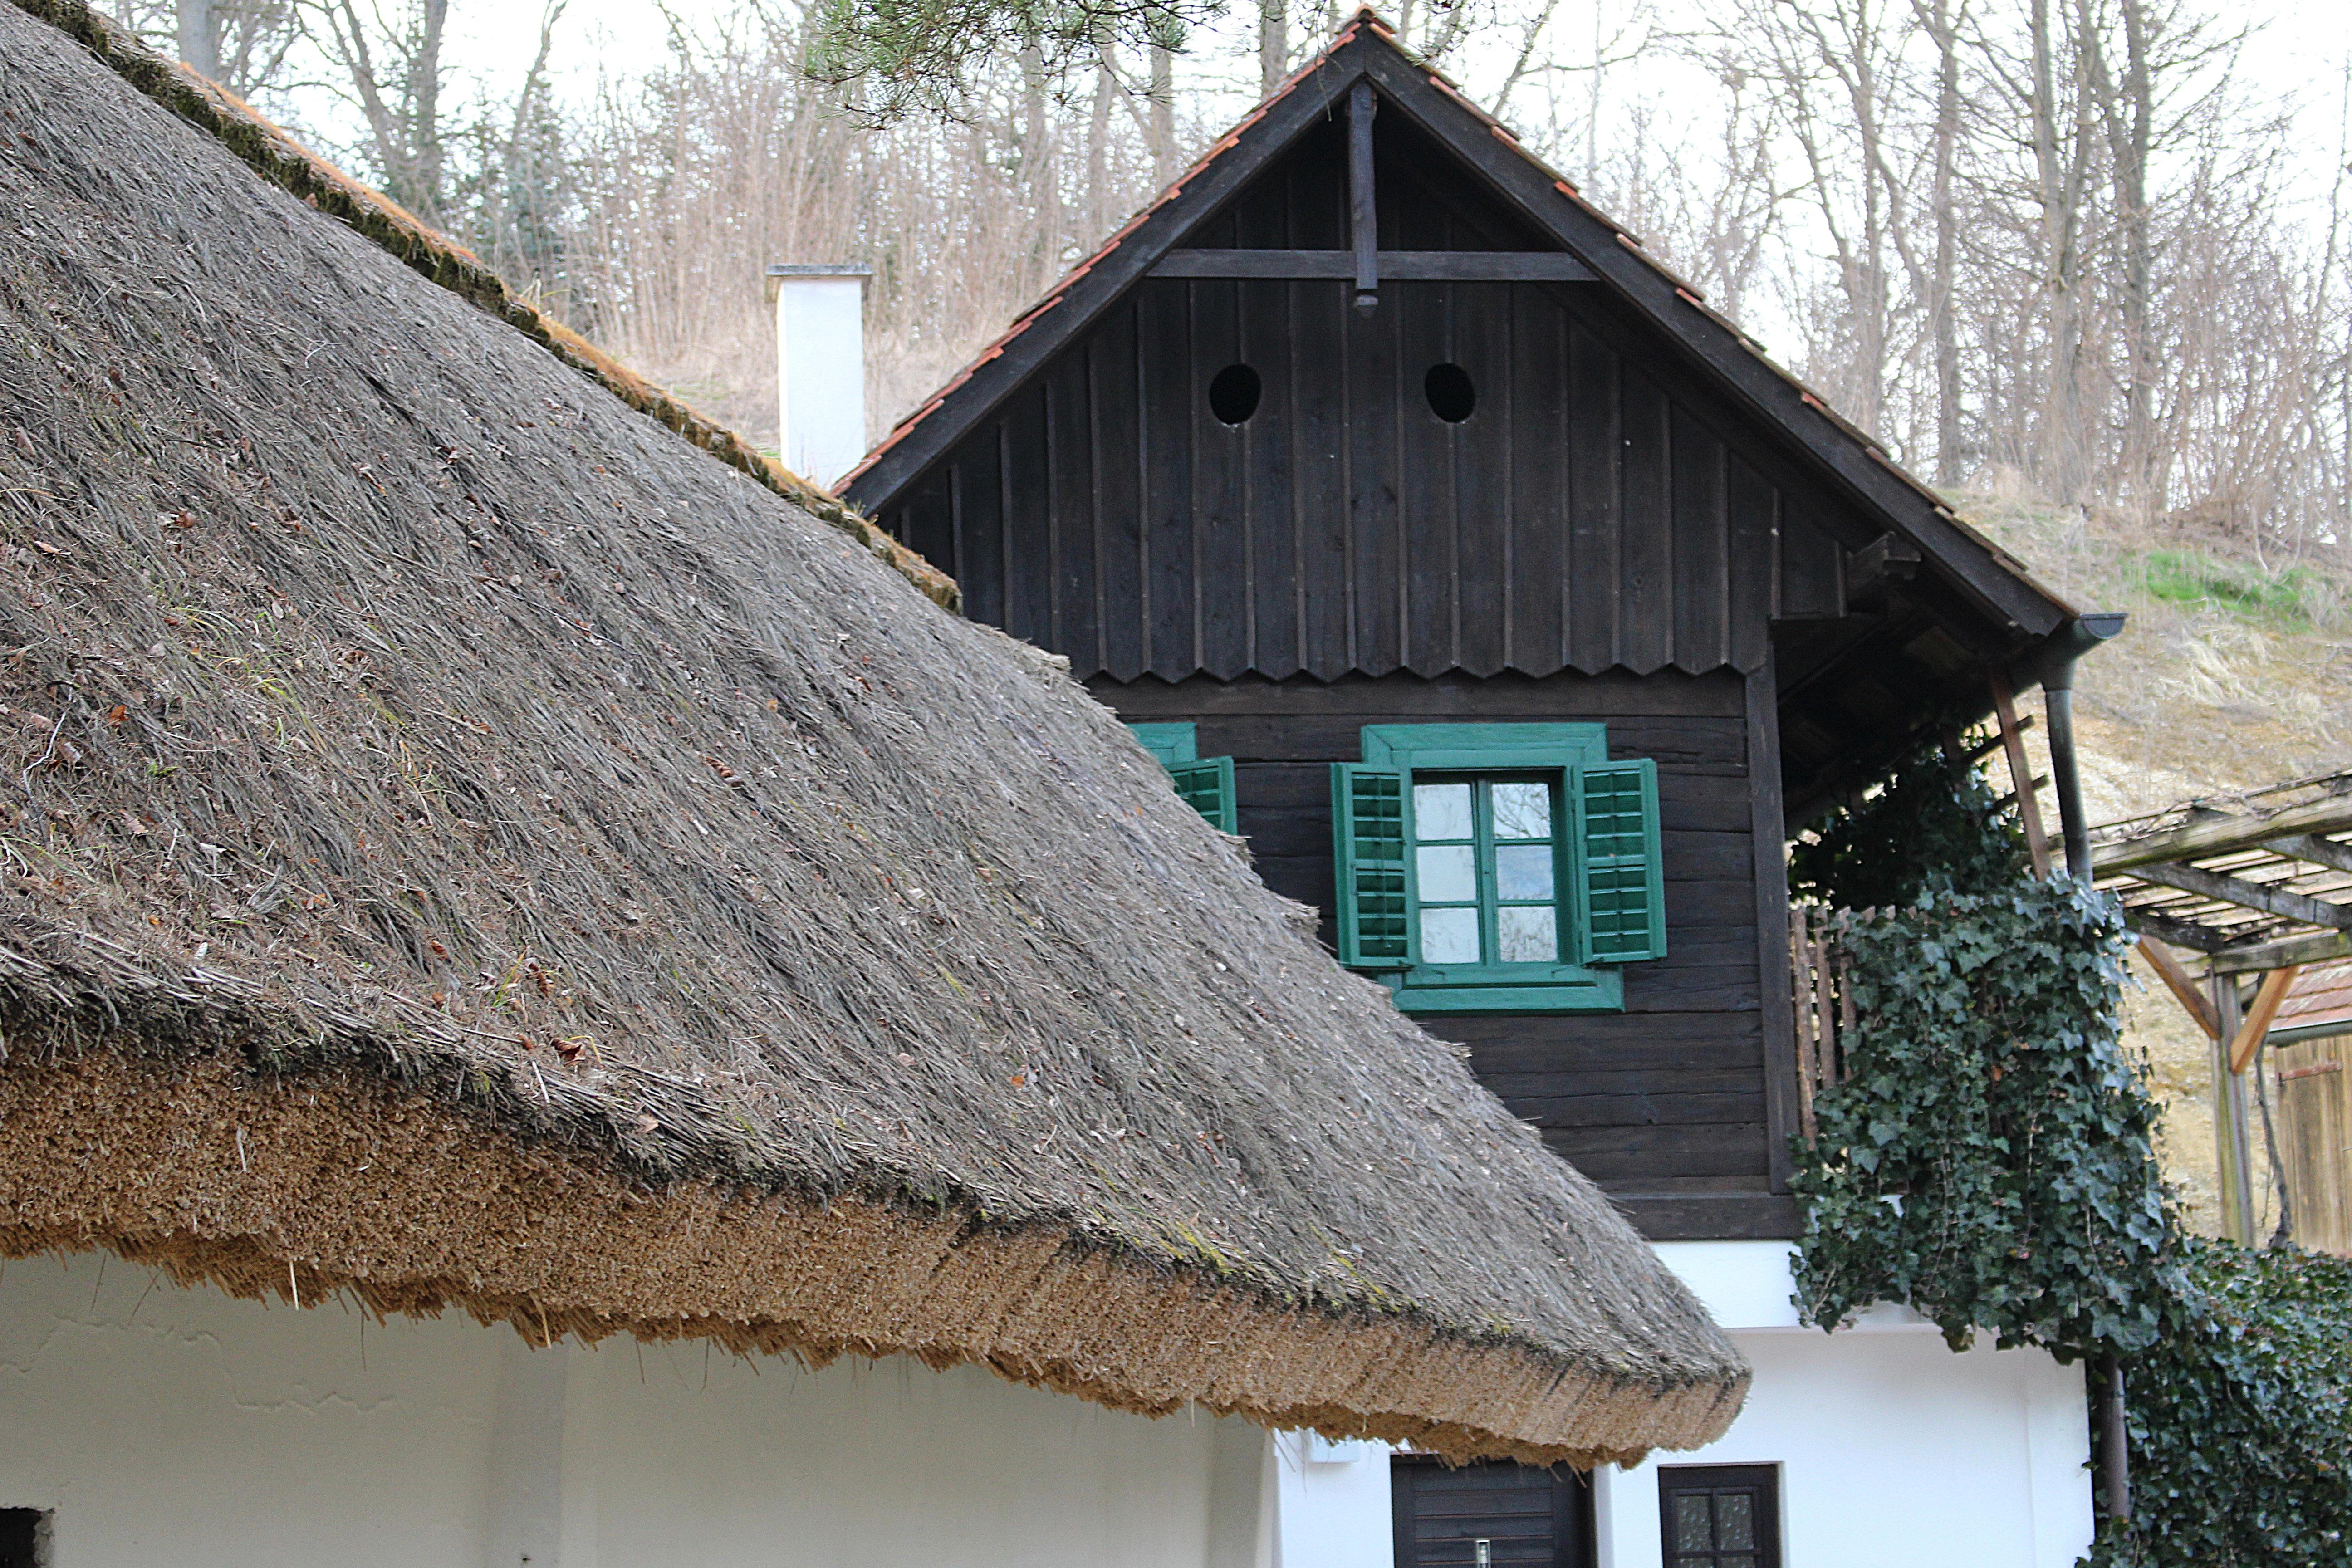 Amazing Holz Haus Fenster Dach Zuhause Ferien Hütte Dorf Hütte Fassade Eigentum  Material Strohdach Stroh Dachdecken Abstellgleis